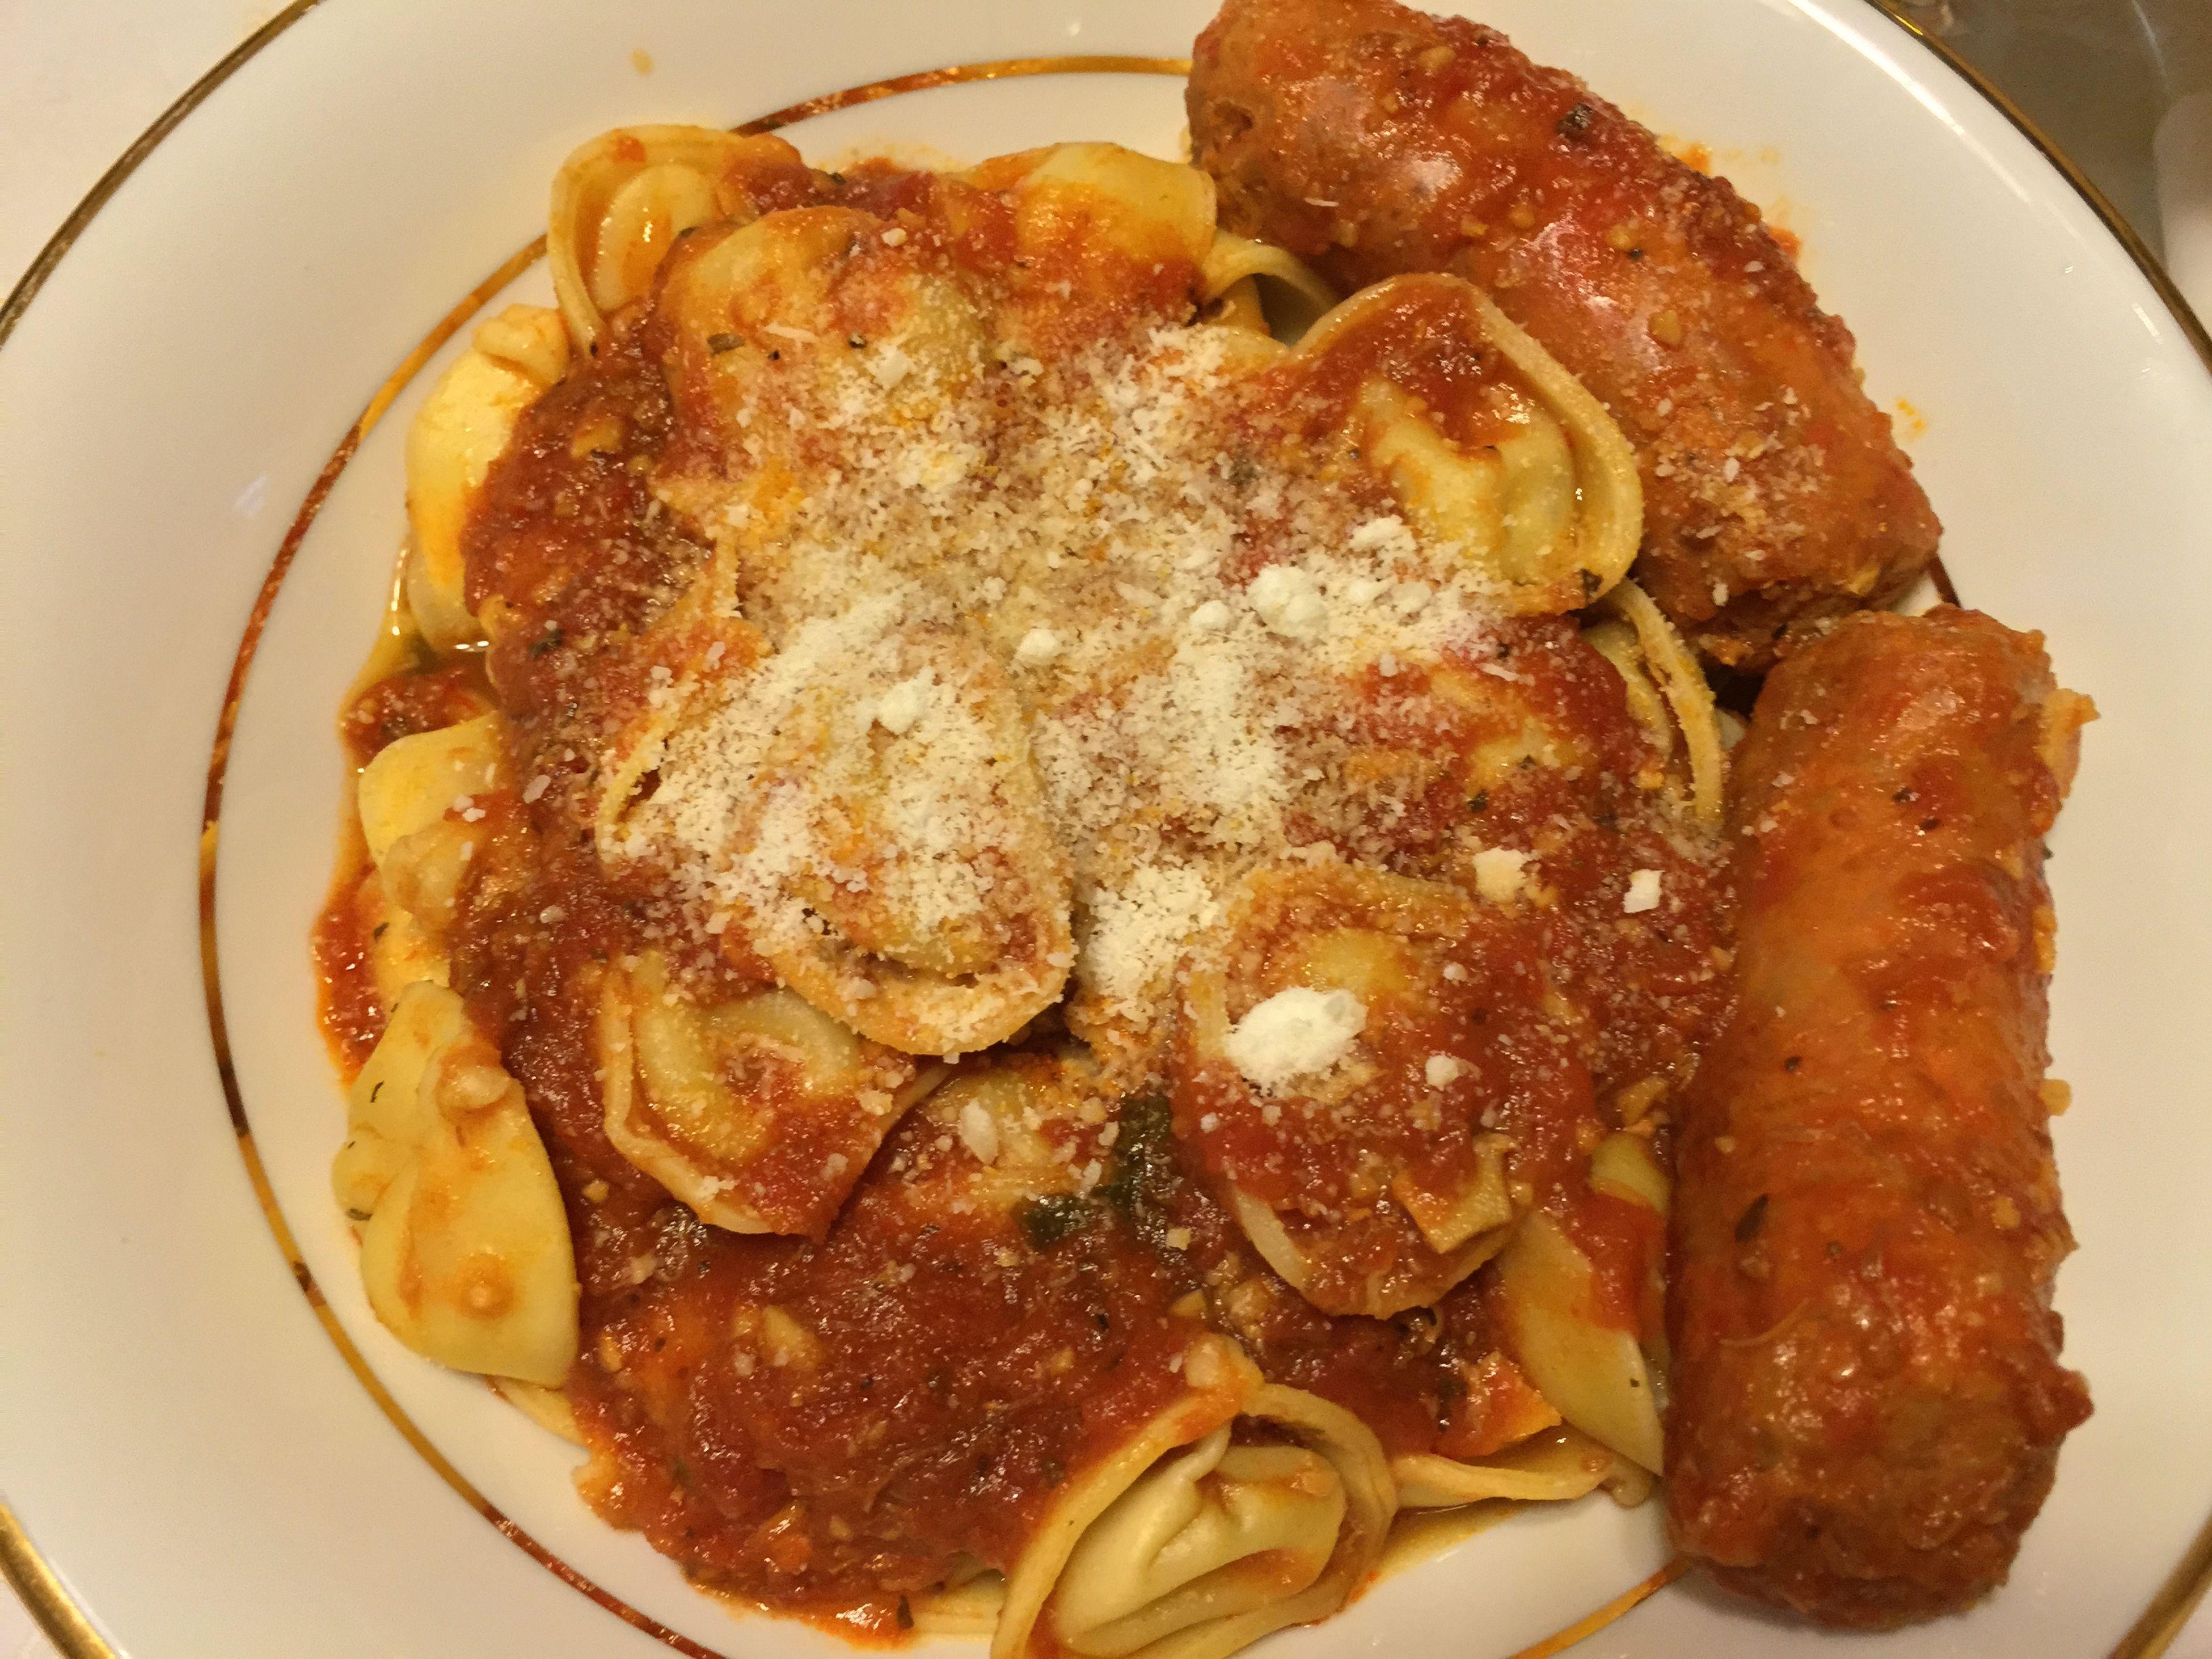 SUNDAY=PASTA ItsAnItalianThing Gravy Pasta ICanCookMyAssOff Nomnombomb MyFoodPics HomemadeItalianWine TheExpensiveWinos